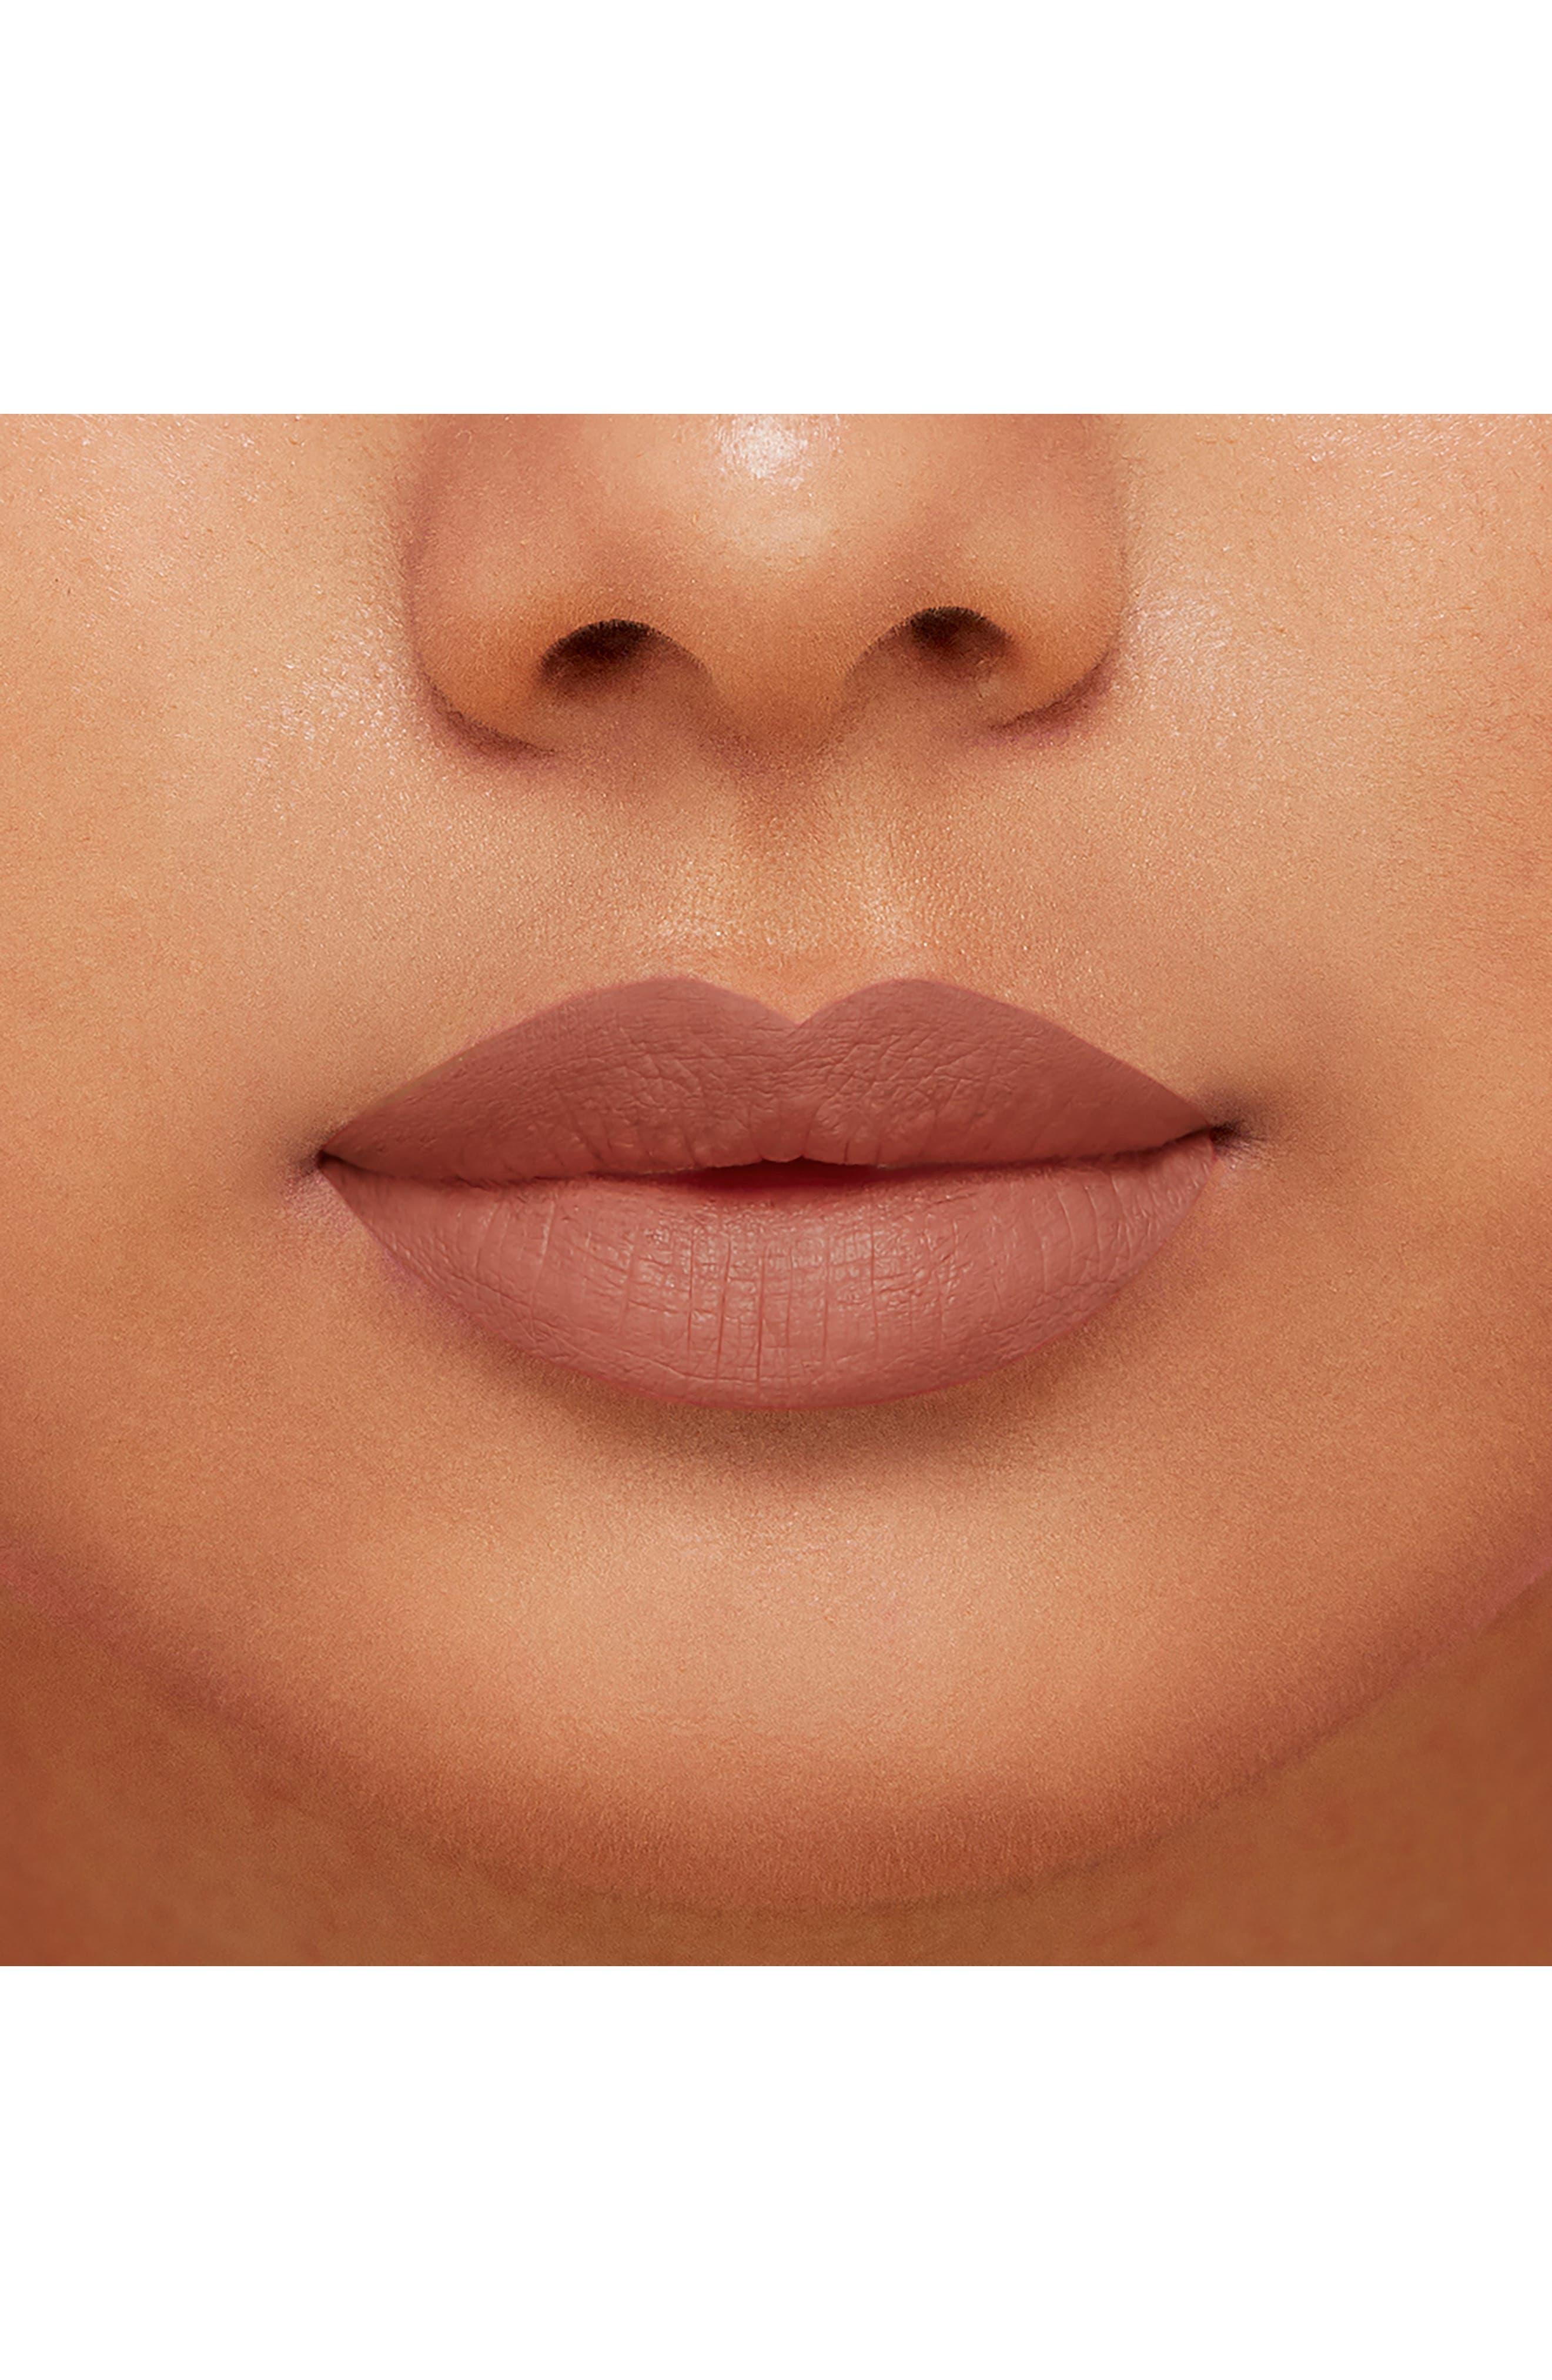 KARL LAGERFELD + MODELCO Kiss Me Karl Lip Lights Lipstick,                             Alternate thumbnail 8, color,                             200